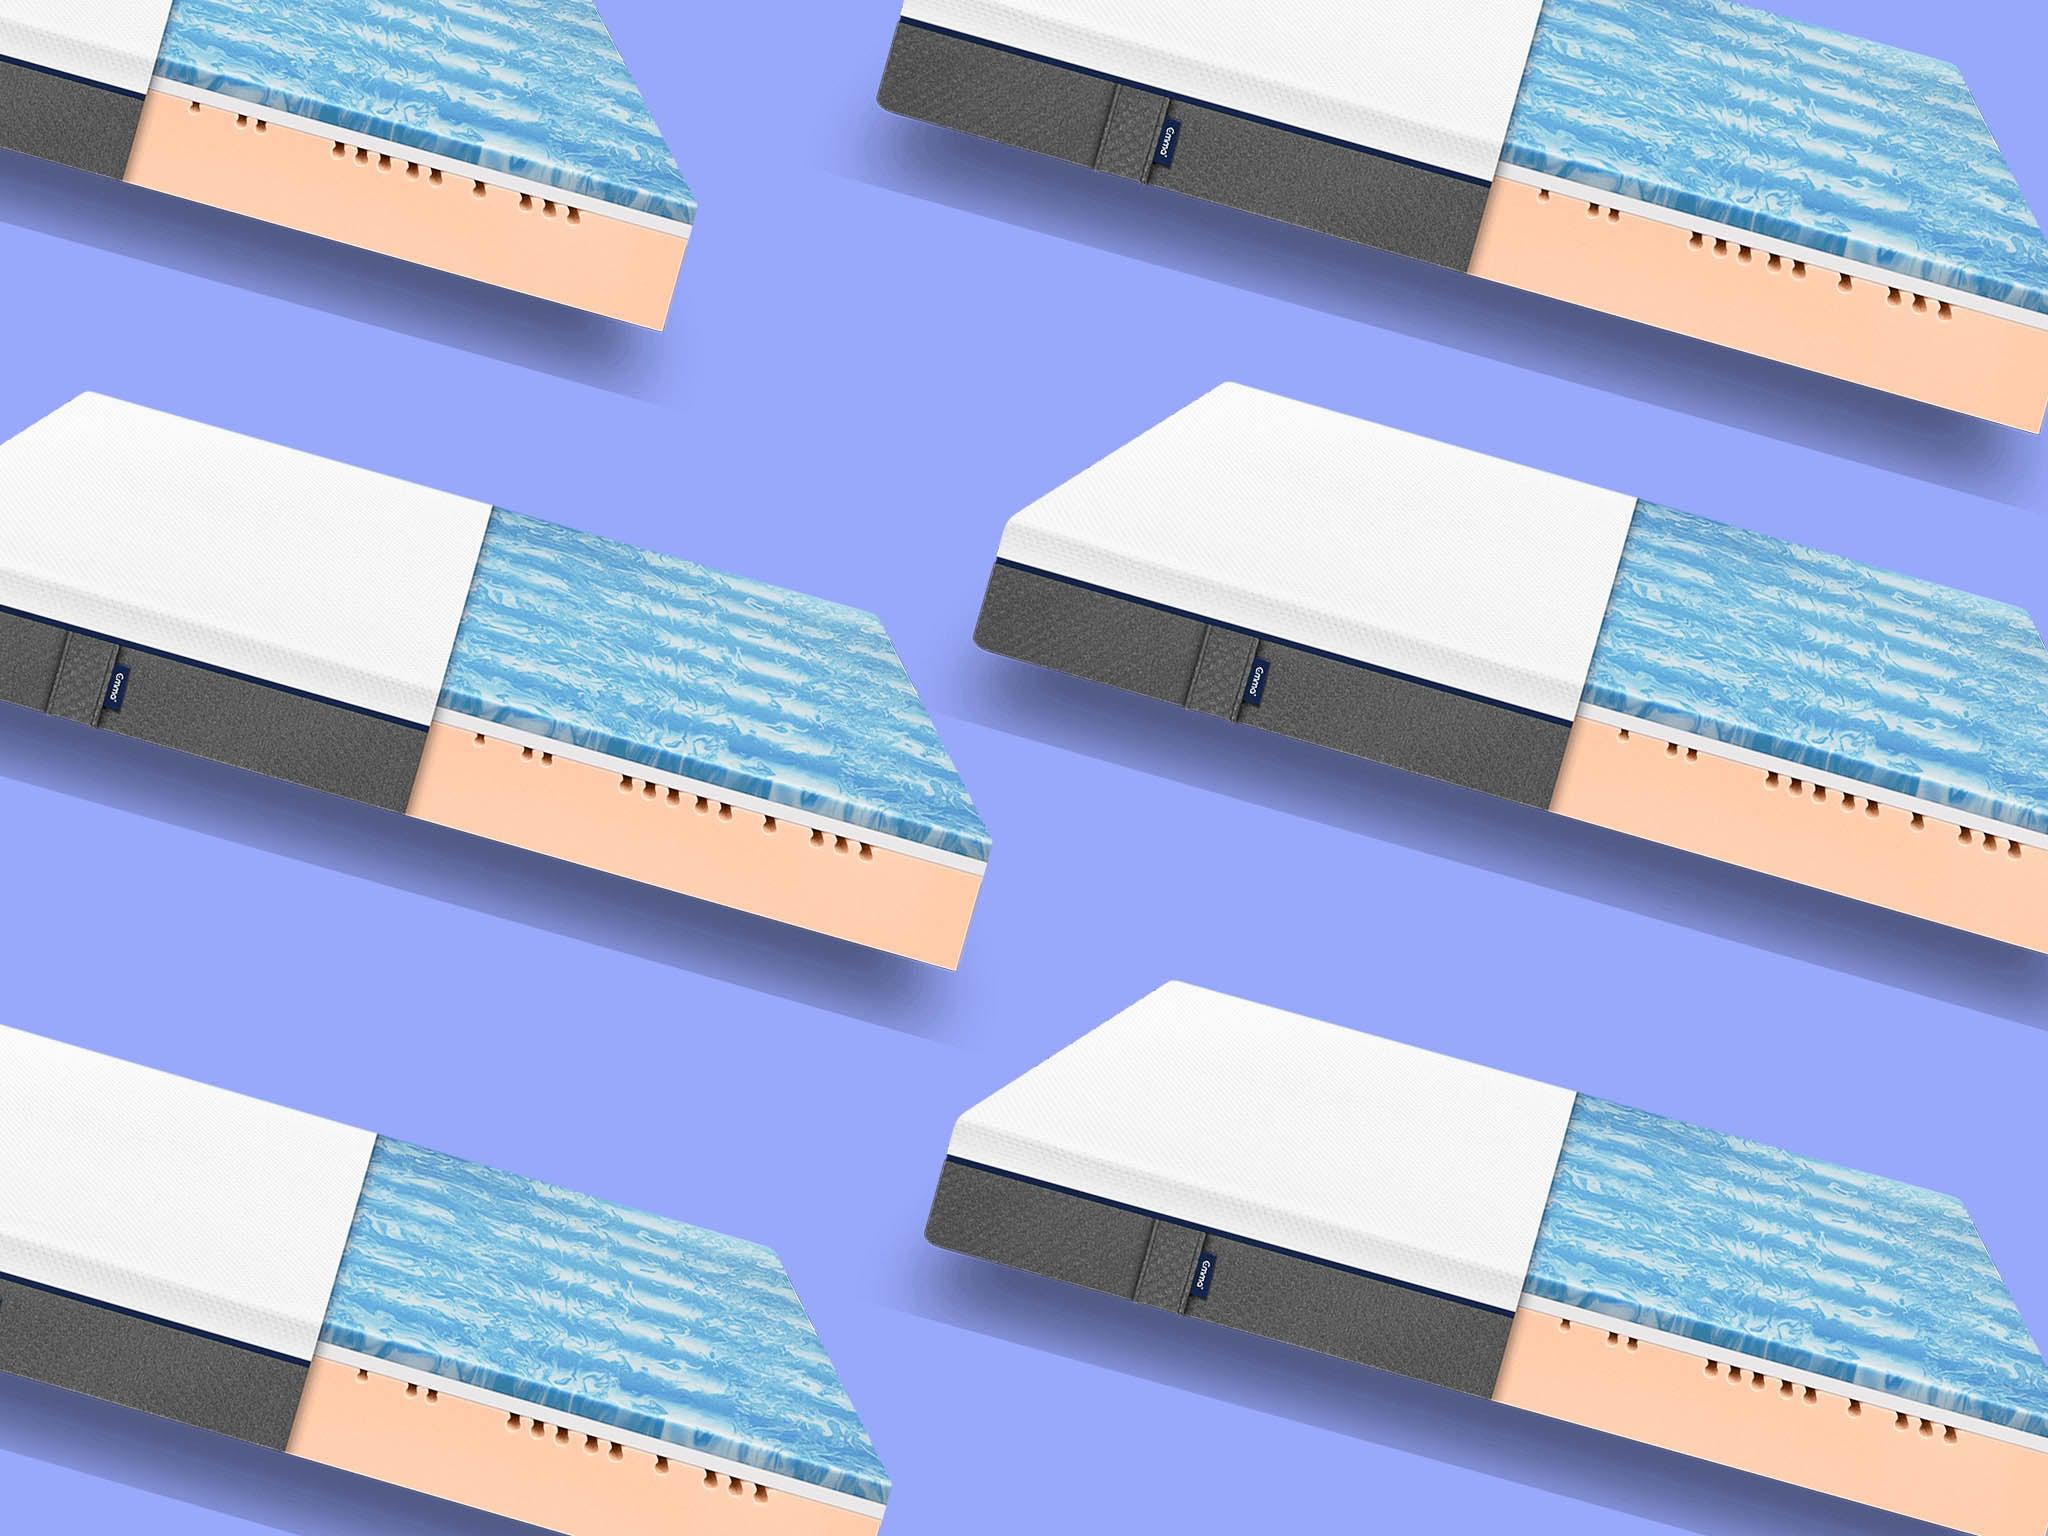 Best mattress guide 2019: How to pick between memory foam